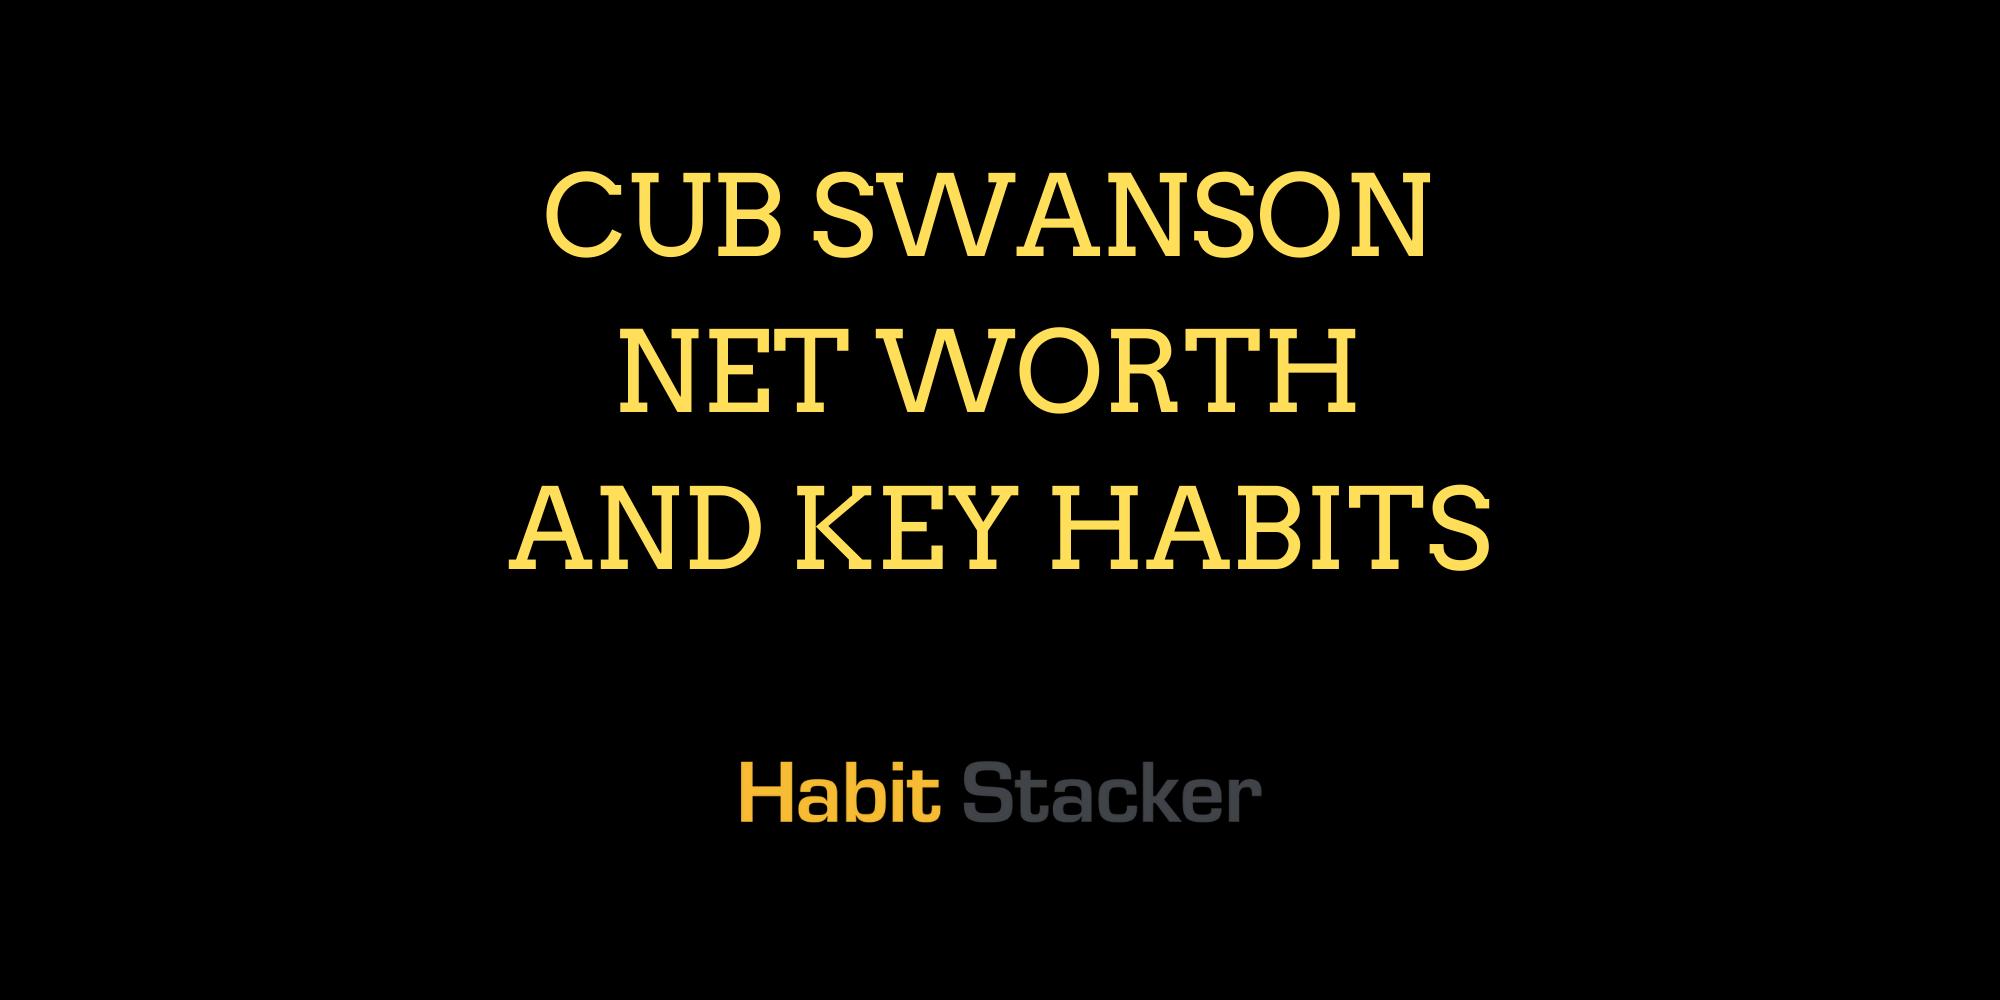 Cub Swanson Net Worth and Key Habits